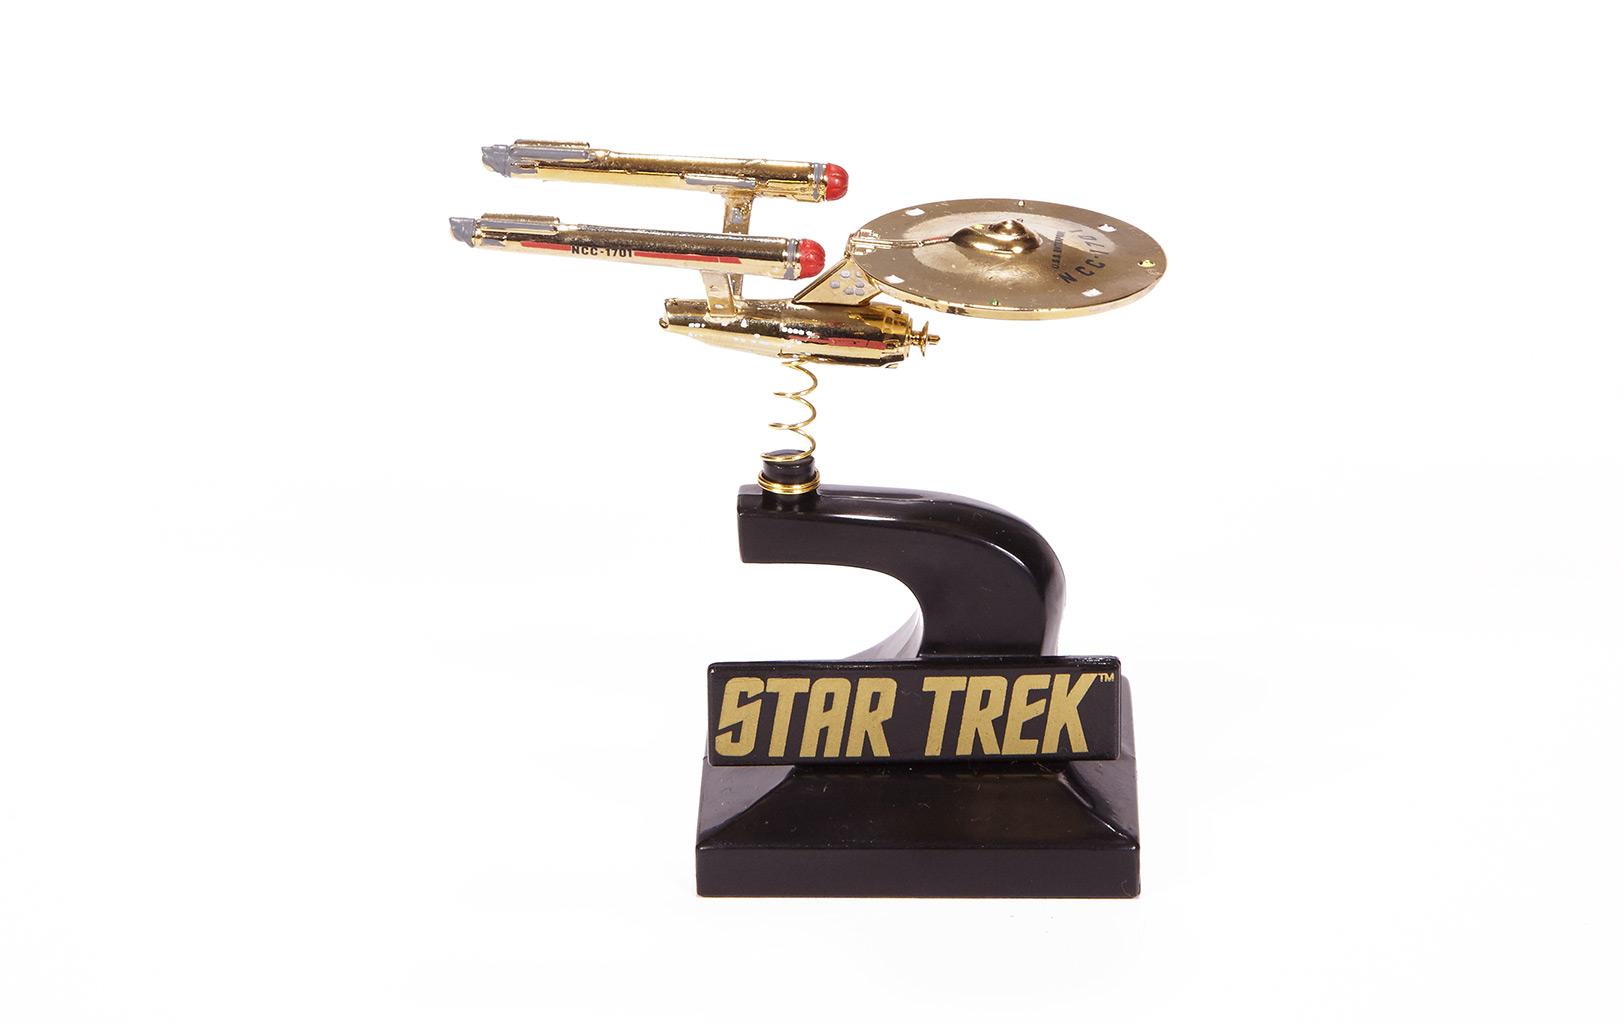 Enterprise Monitor Mate Bobble Ship (24K Gold-Plated)